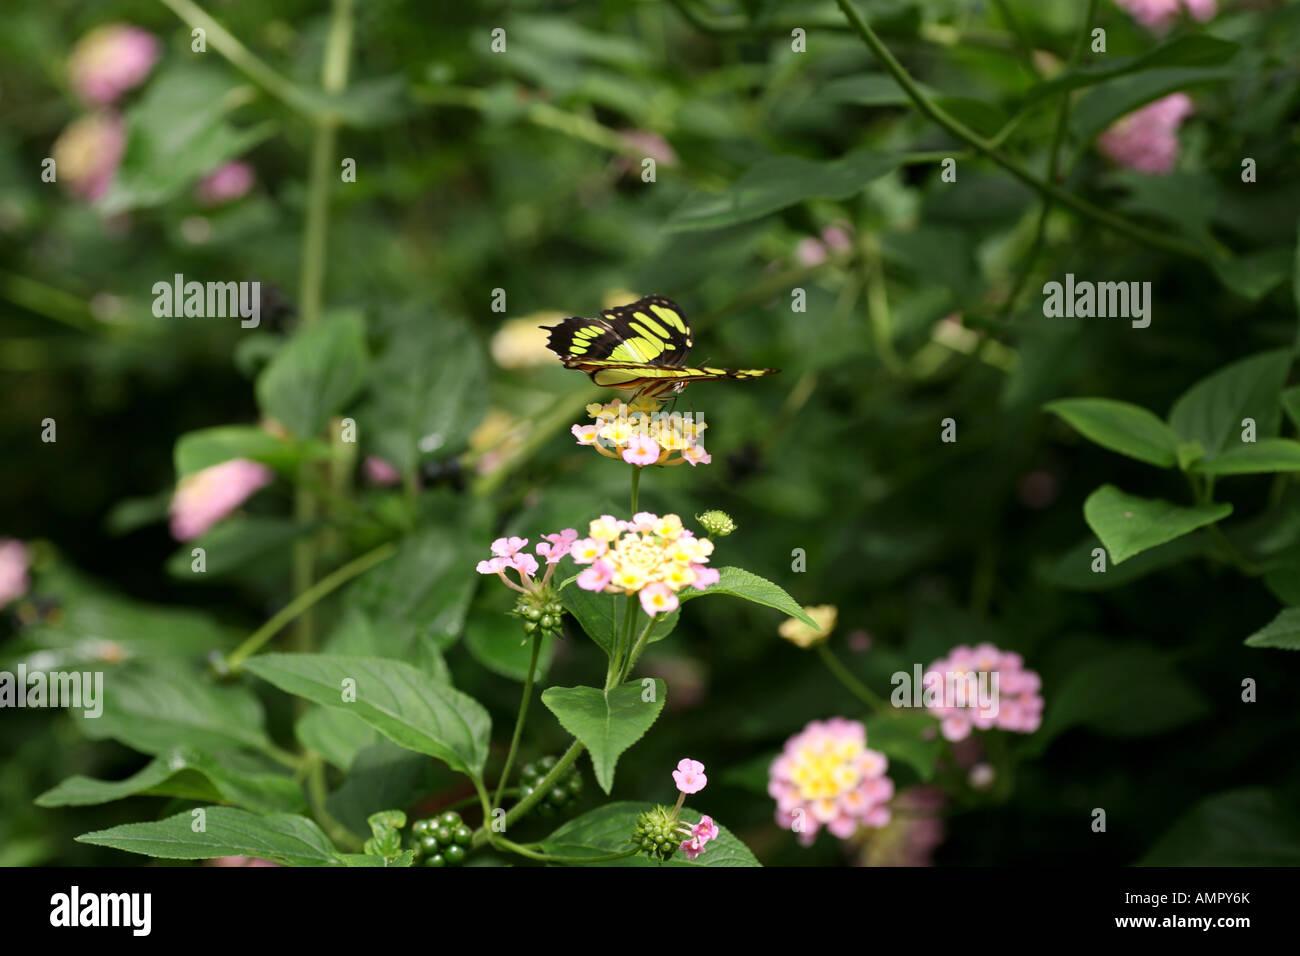 Malachite Butterfly on flower Stock Photo